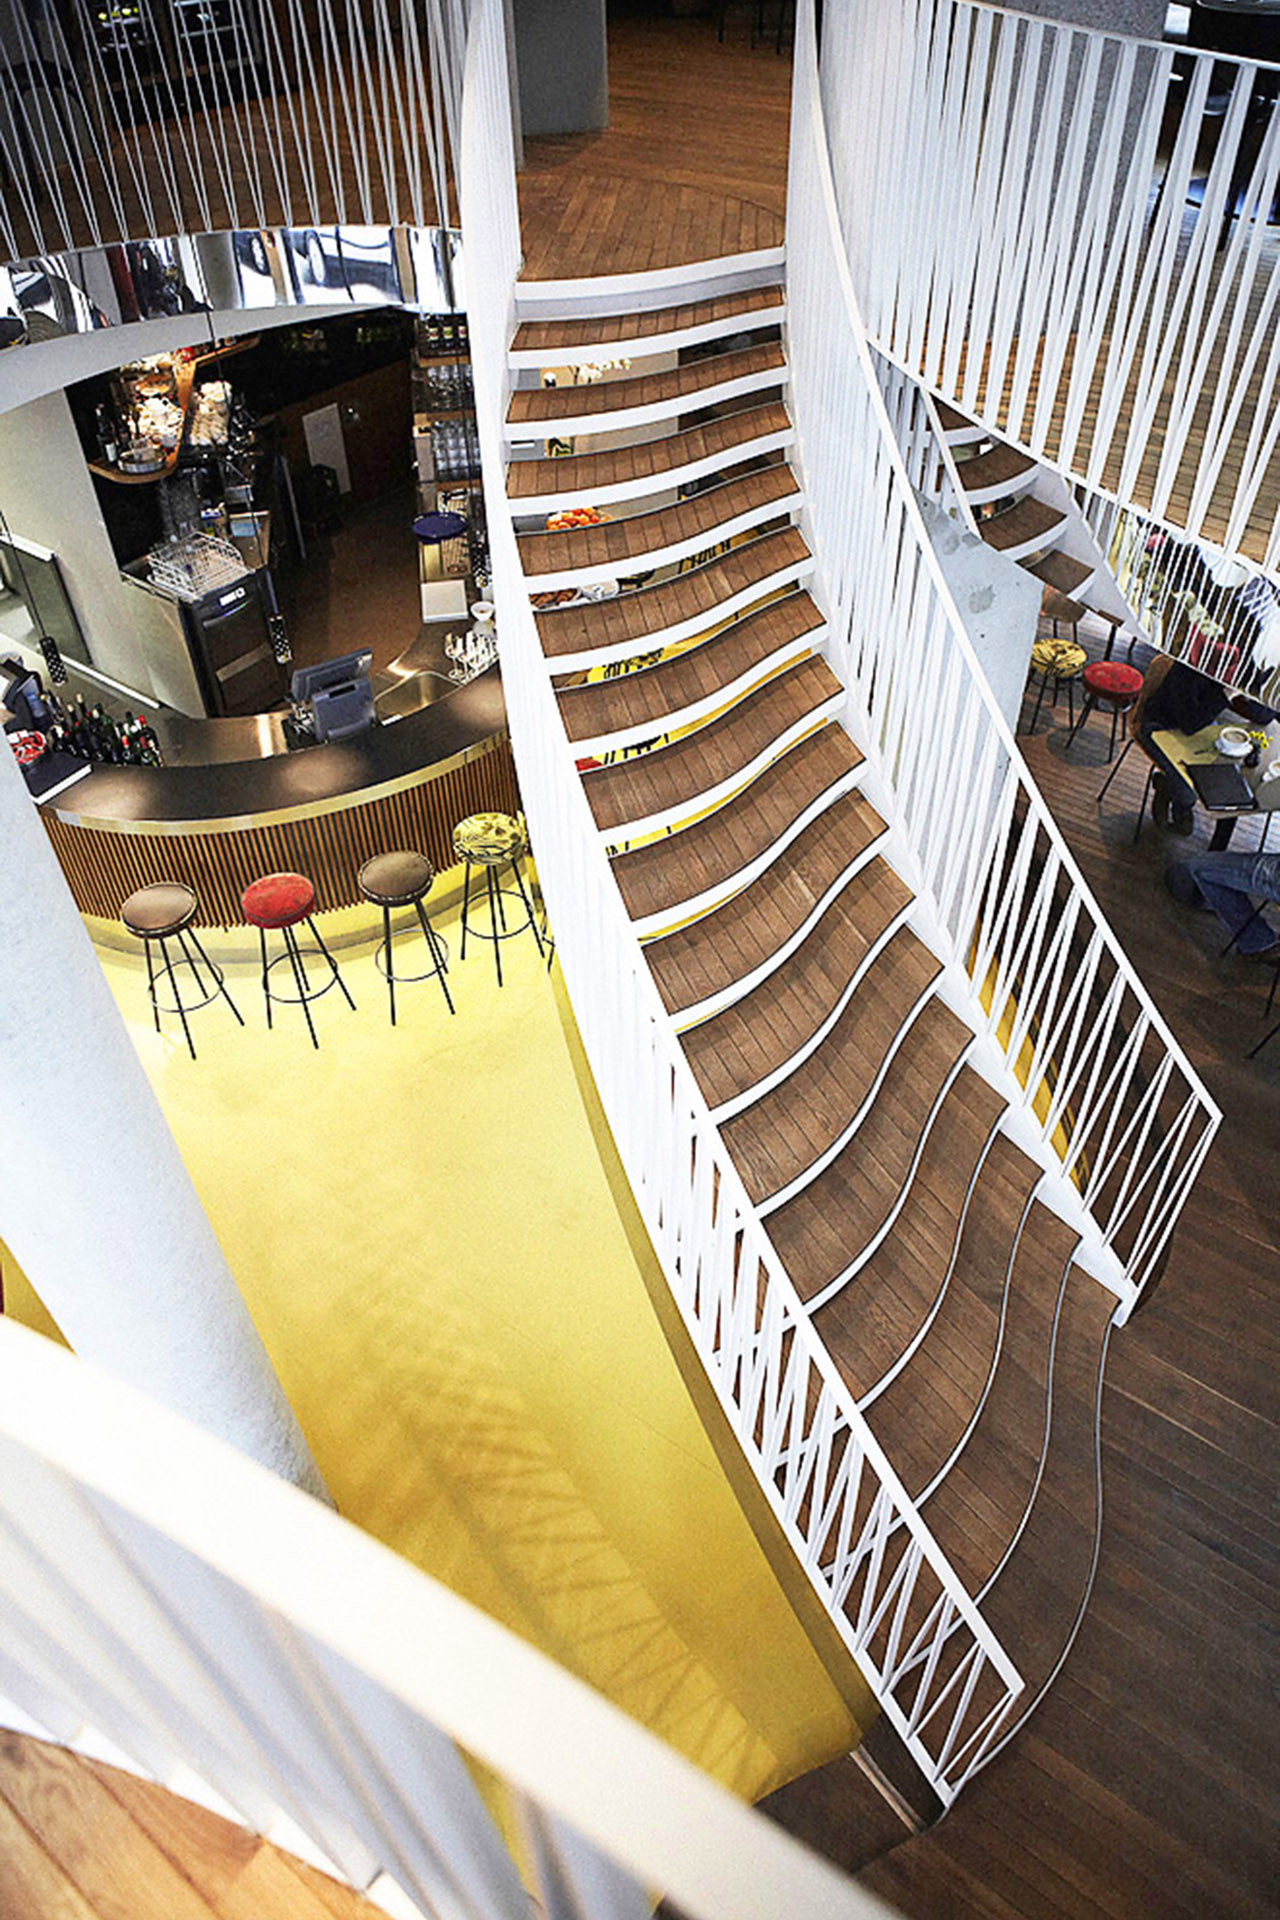 020-interior-design-hospitality-cafe-restaurant-glockenbach-muenchen-buero-philipp-moeller.jpg